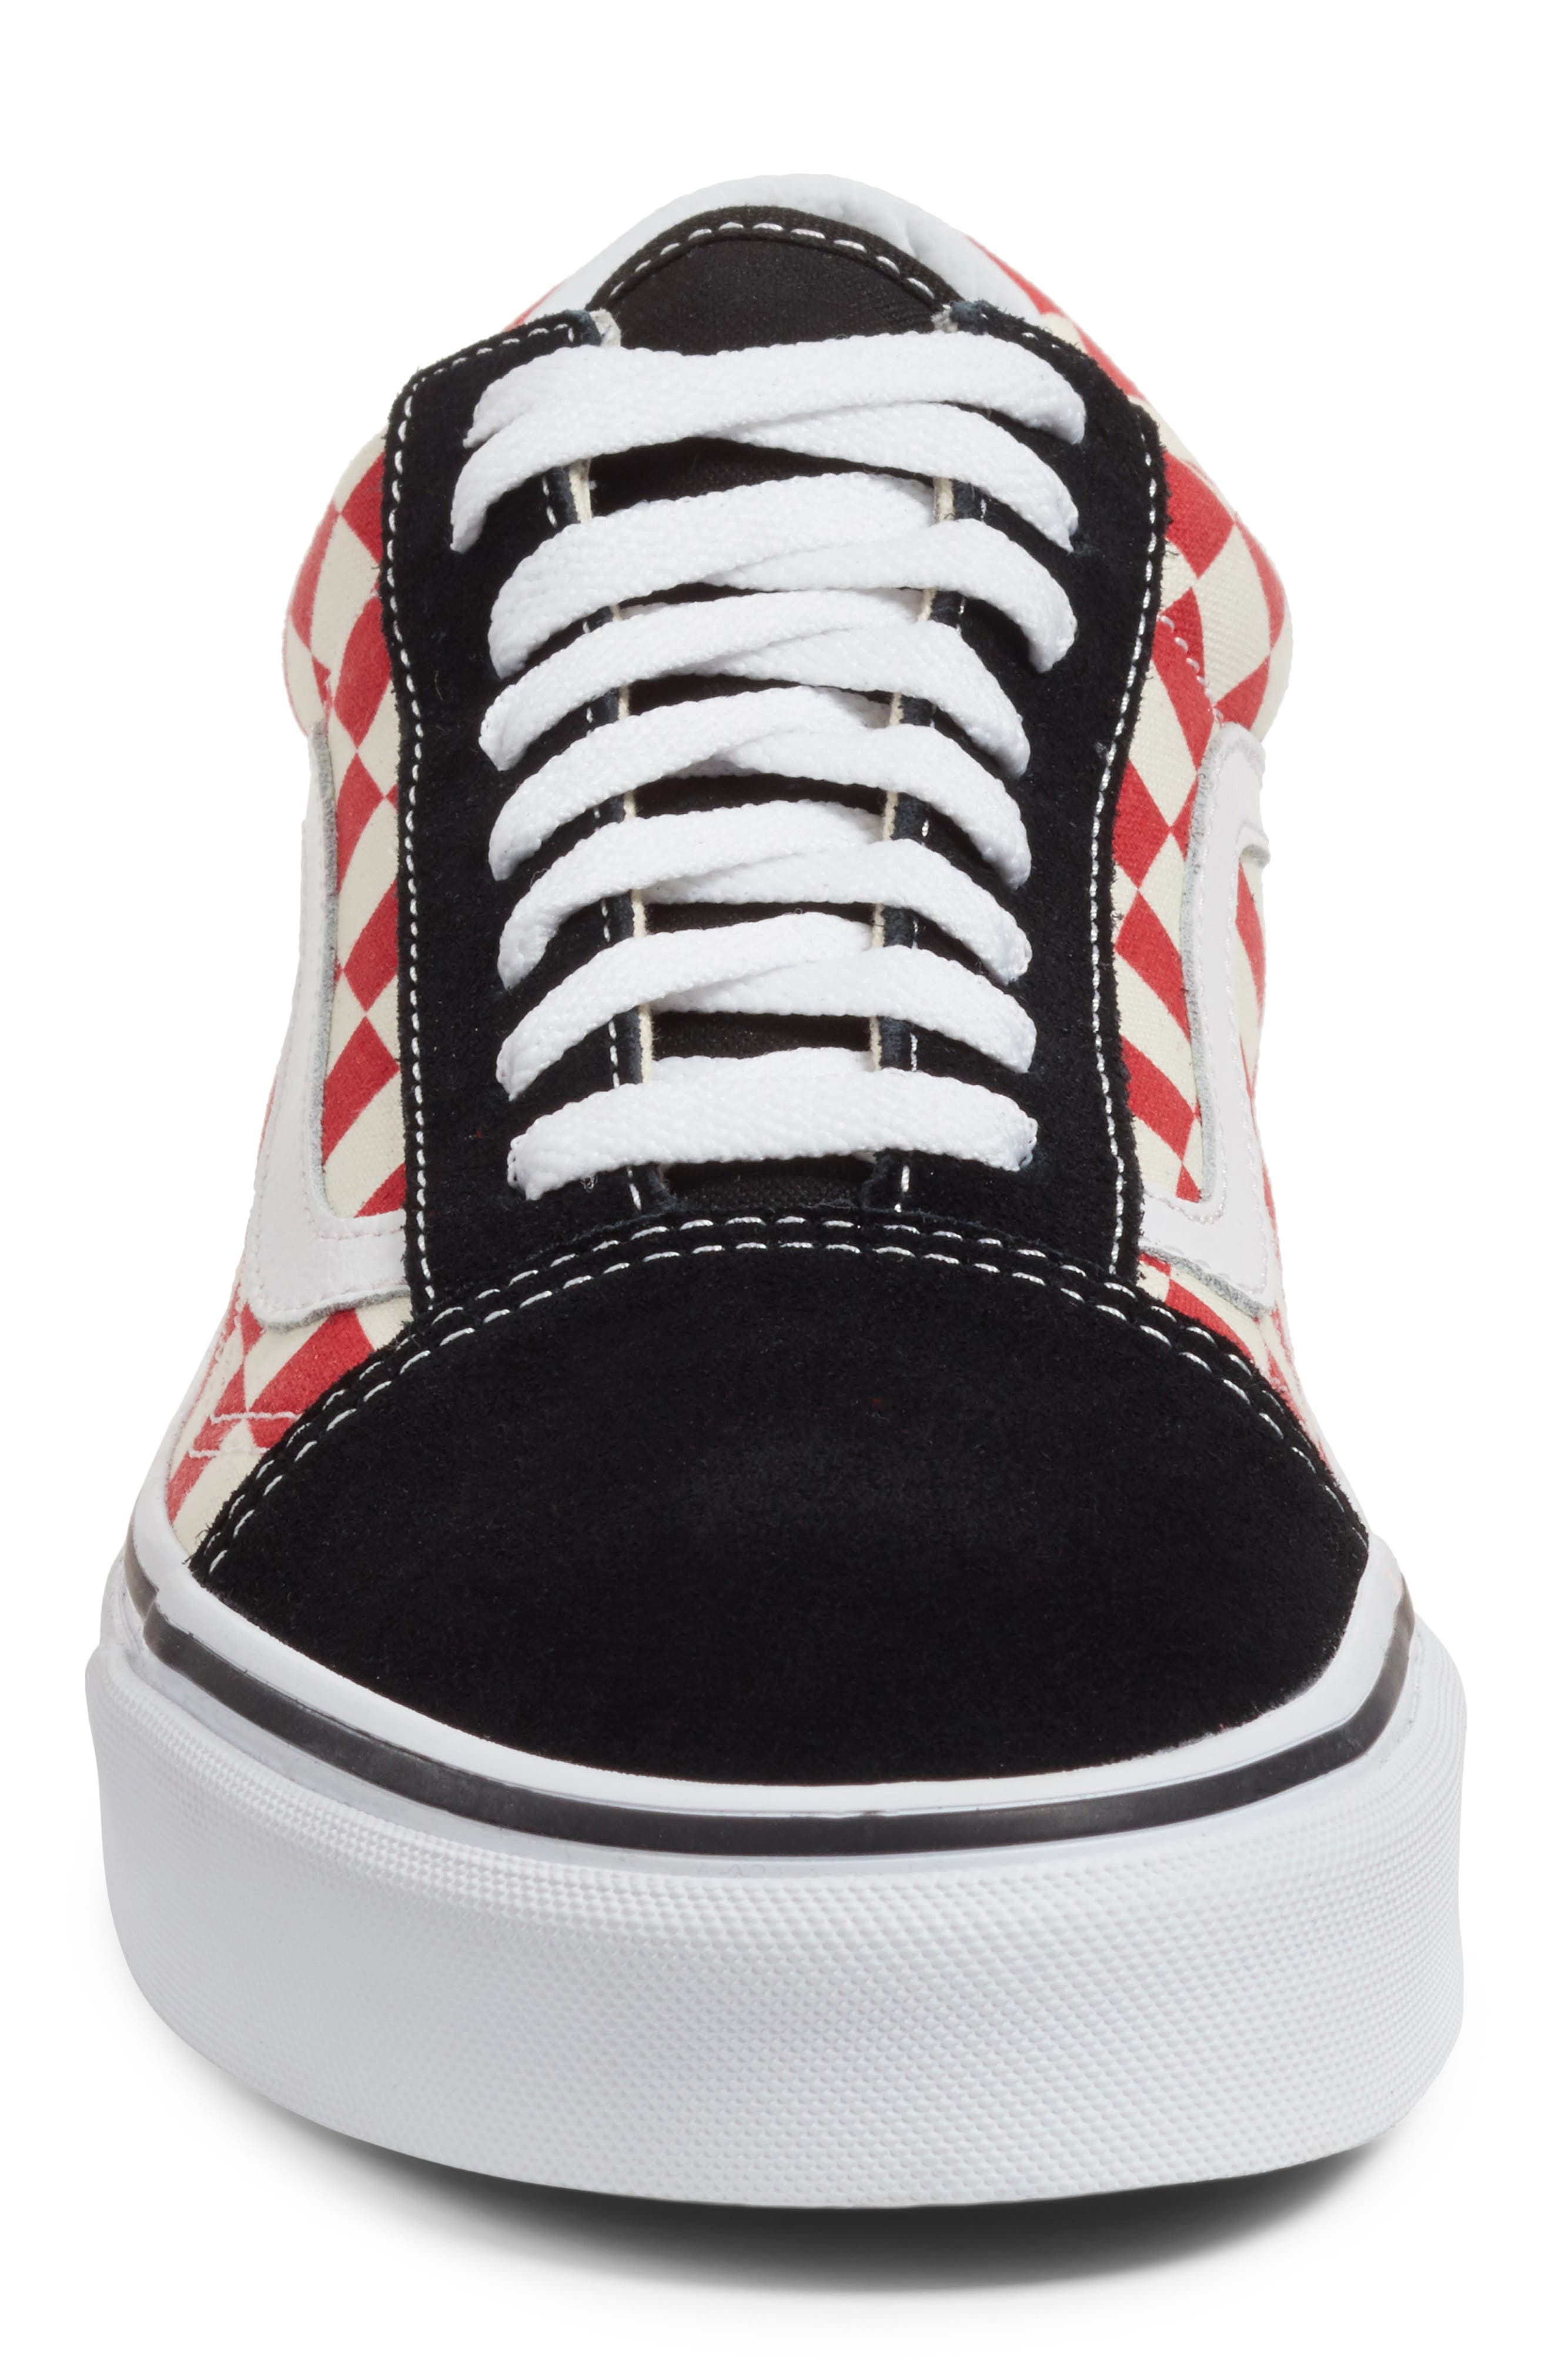 Old Skool Sneaker,                             Alternate thumbnail 4, color,                             Black/ Red Checkerboard